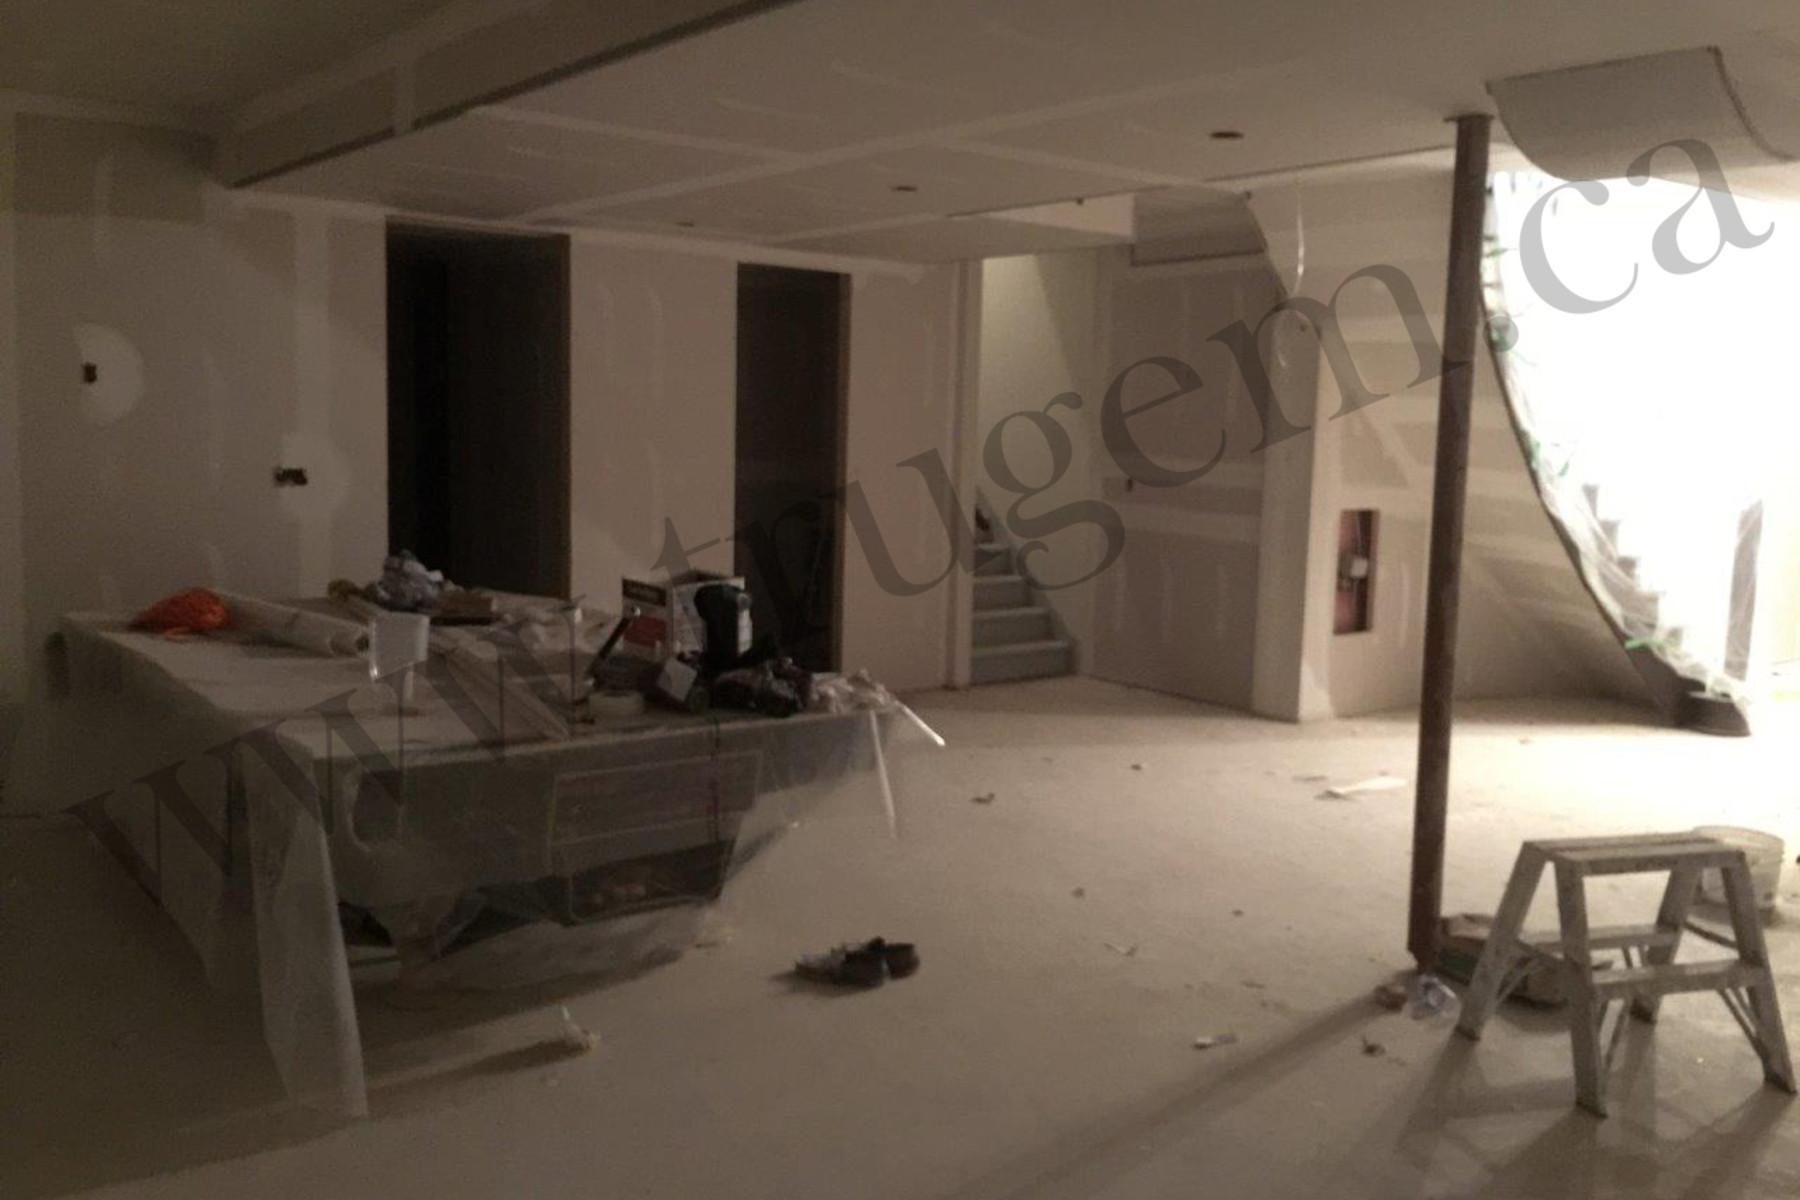 Castlemore renovation work